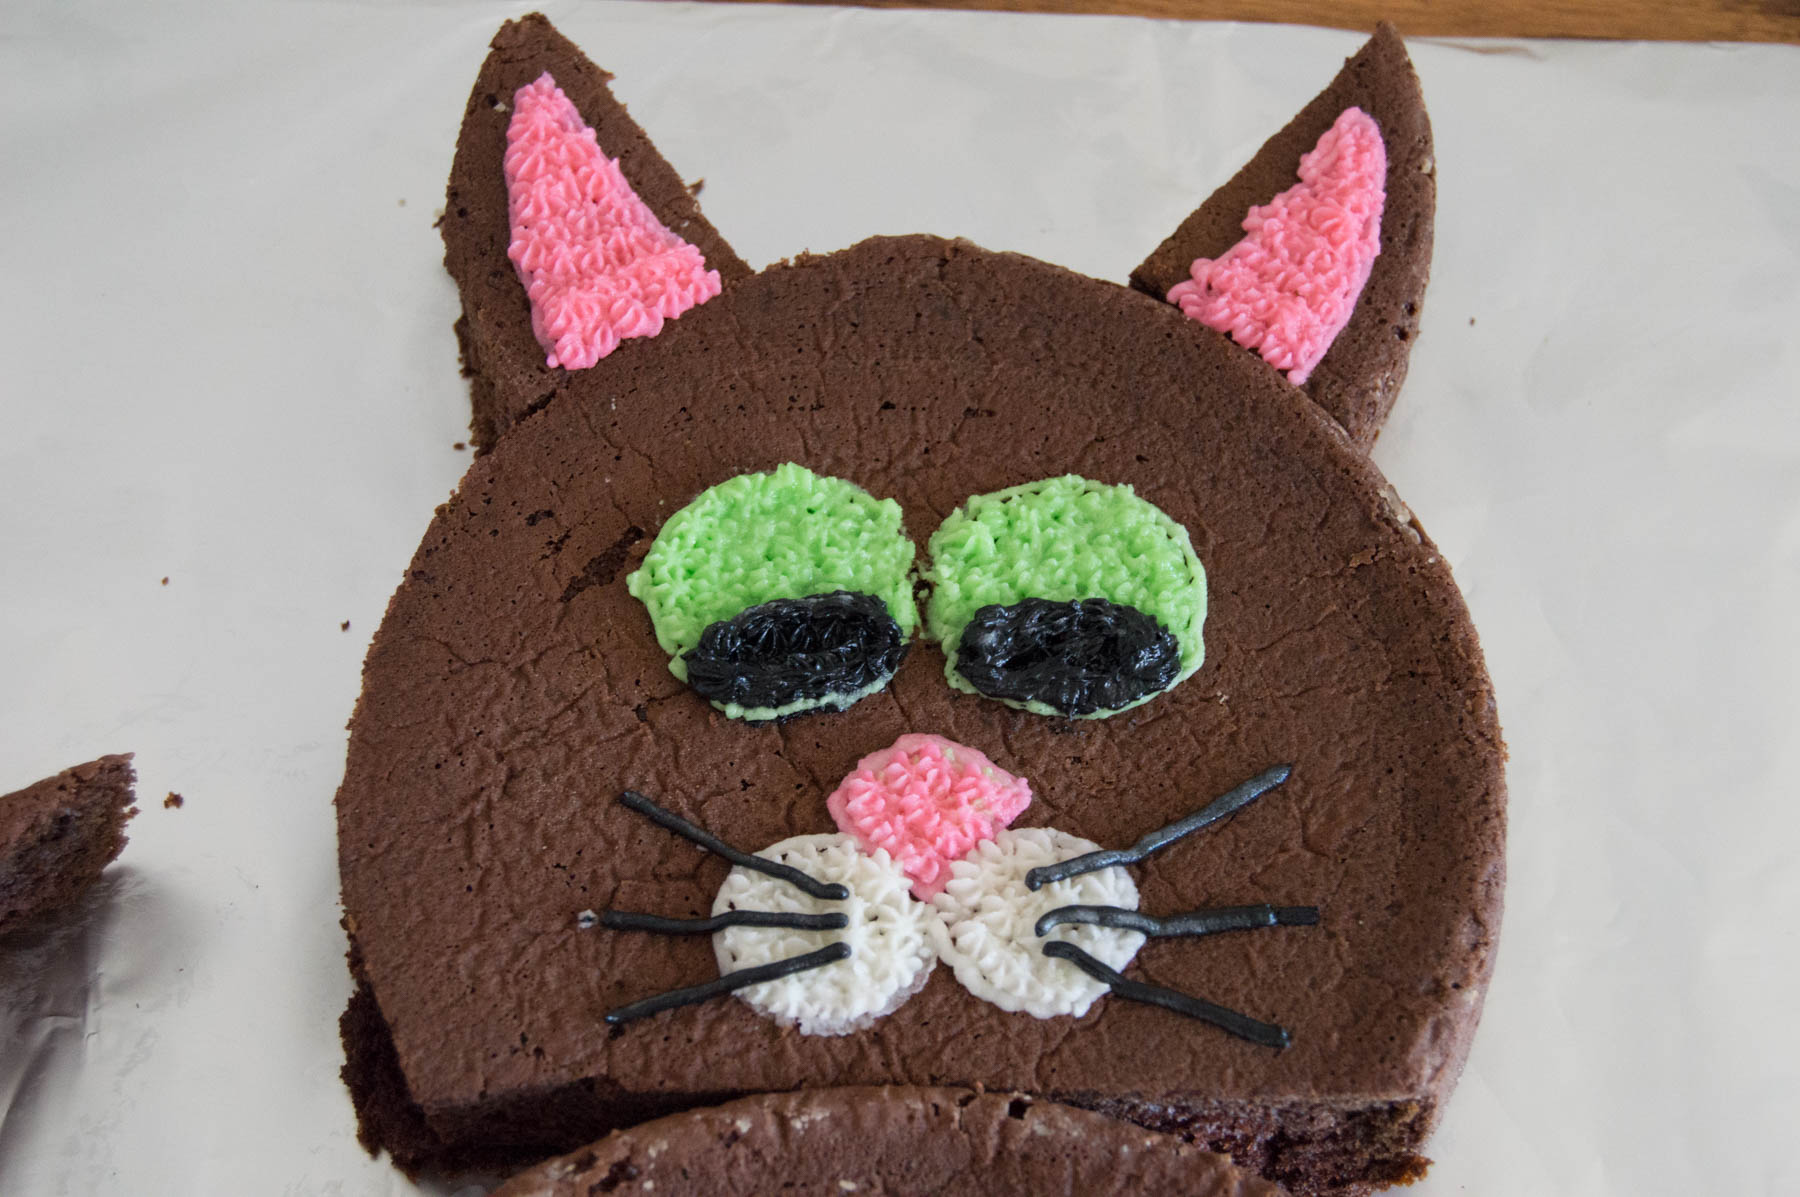 Cake Cut-Up Cake | Homan at Home